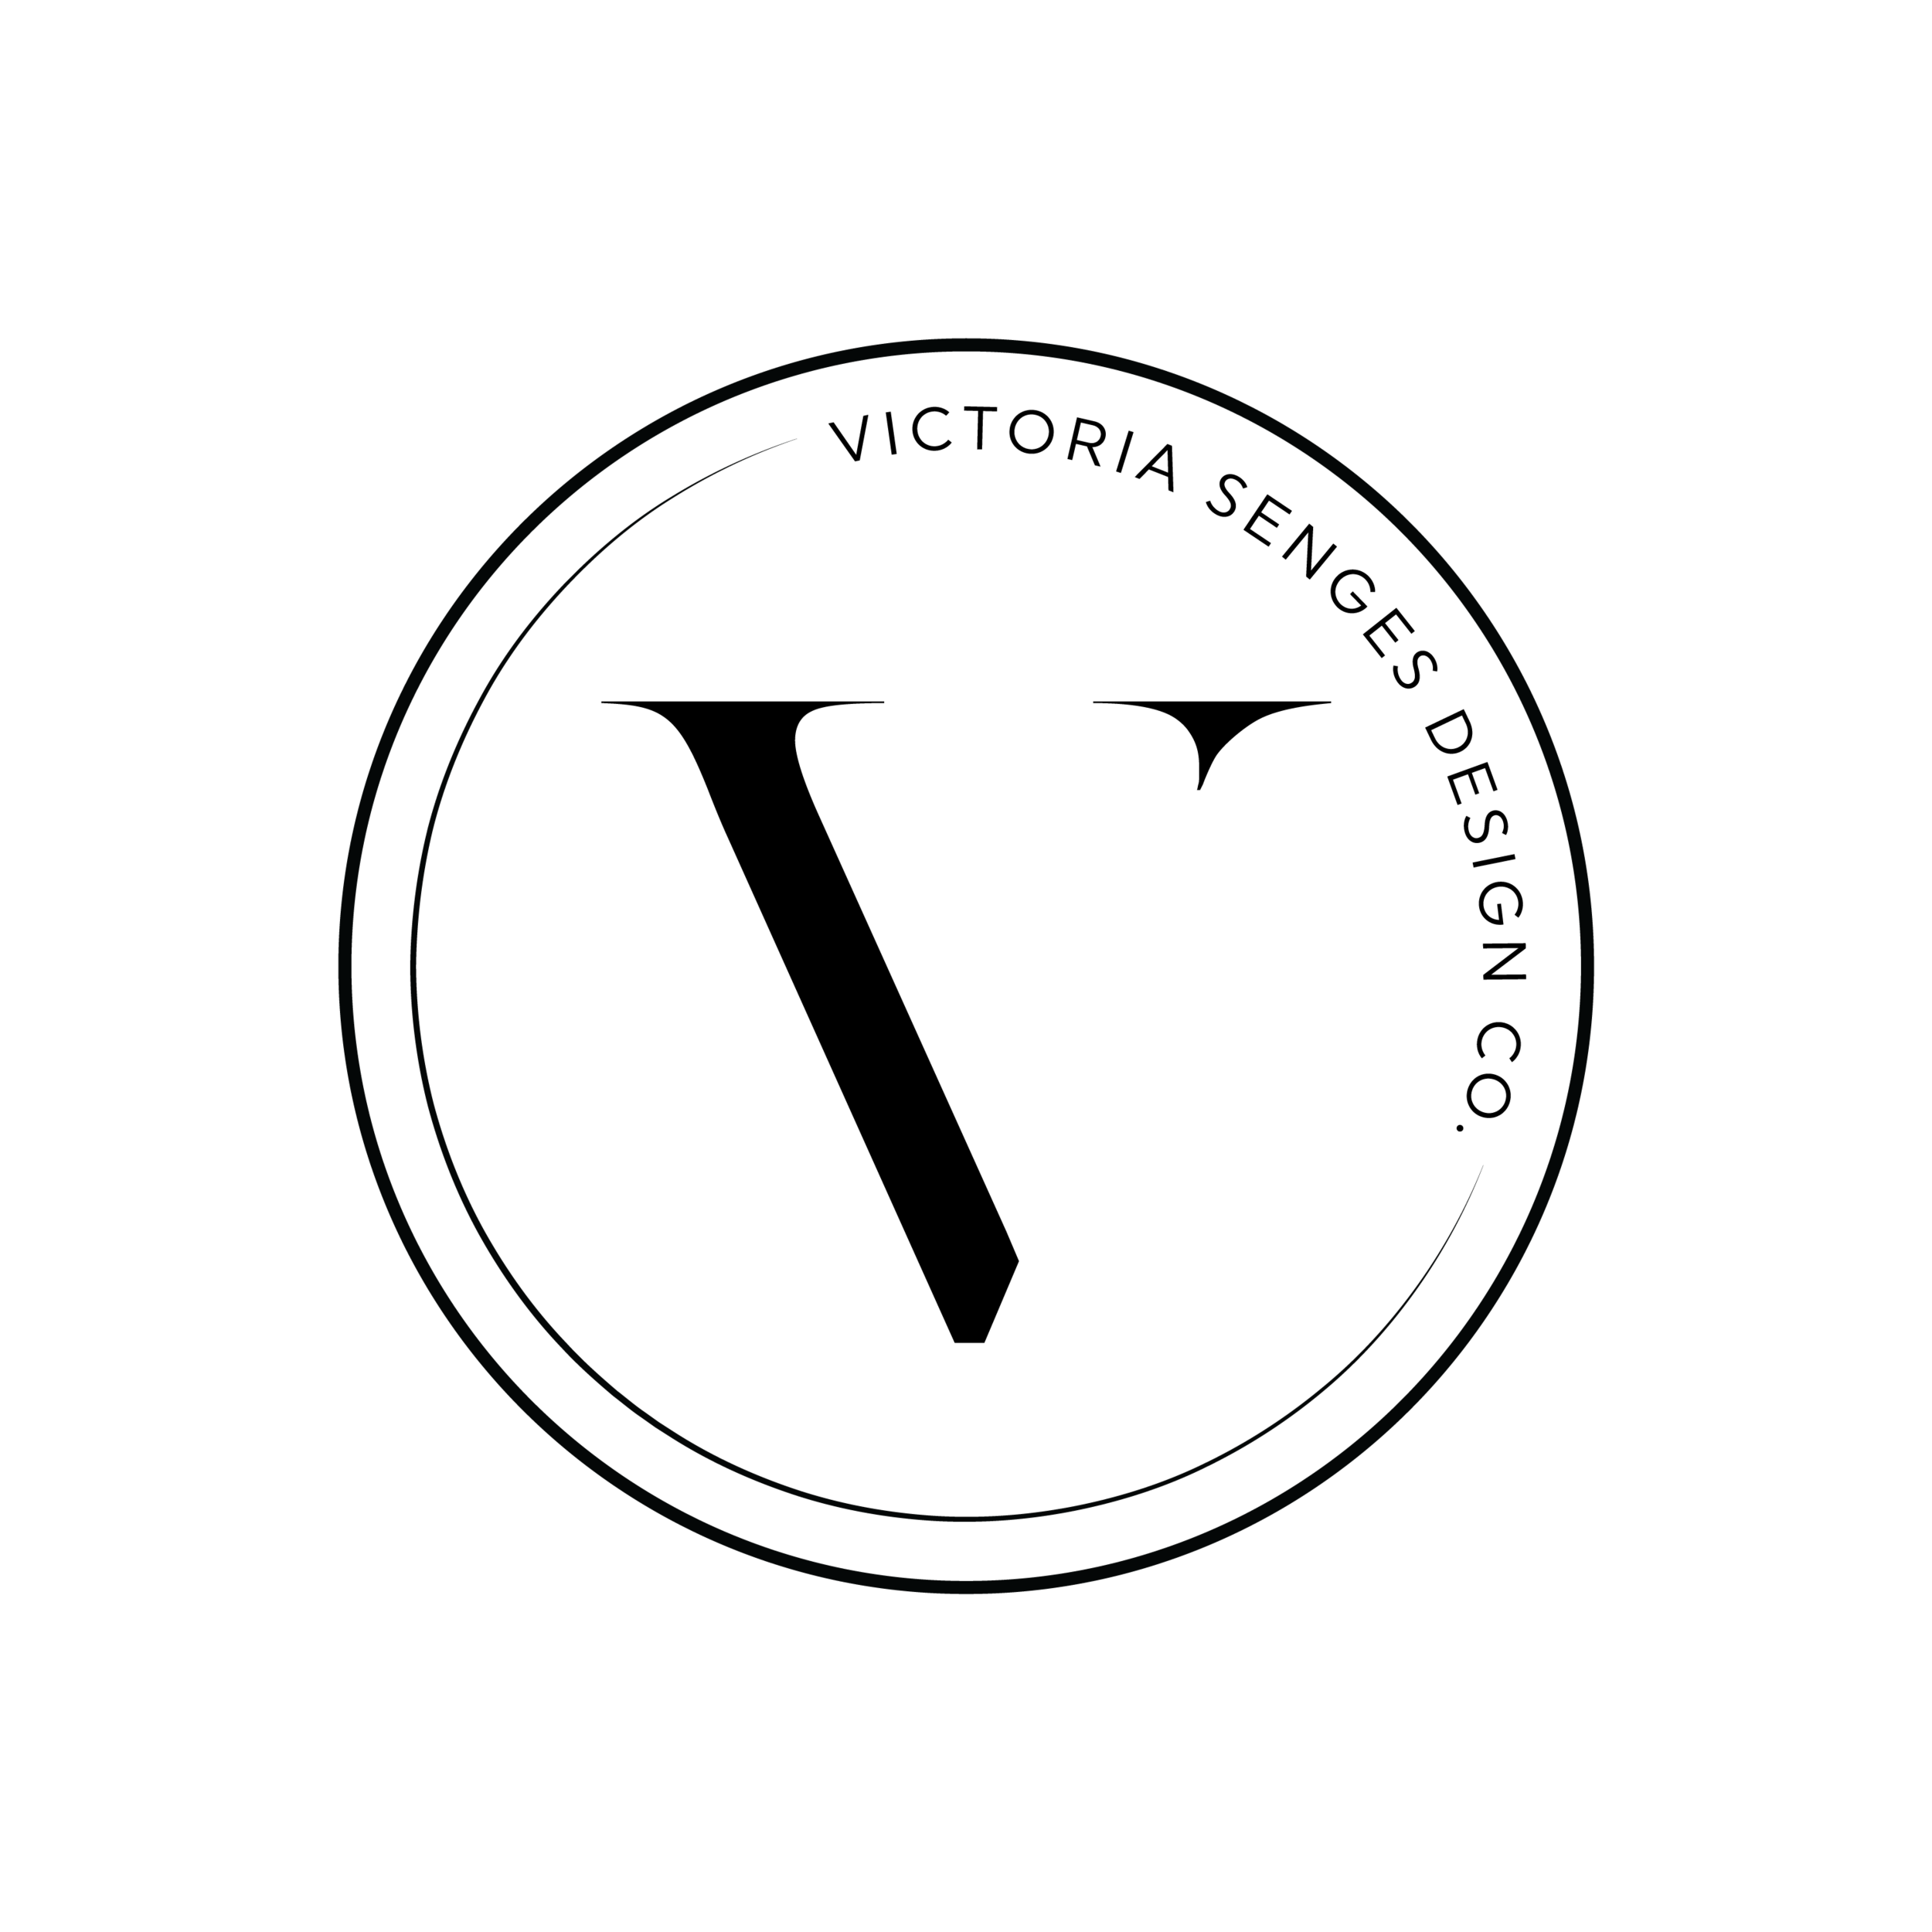 VSDC_Branding-2019-Submark-Black.png